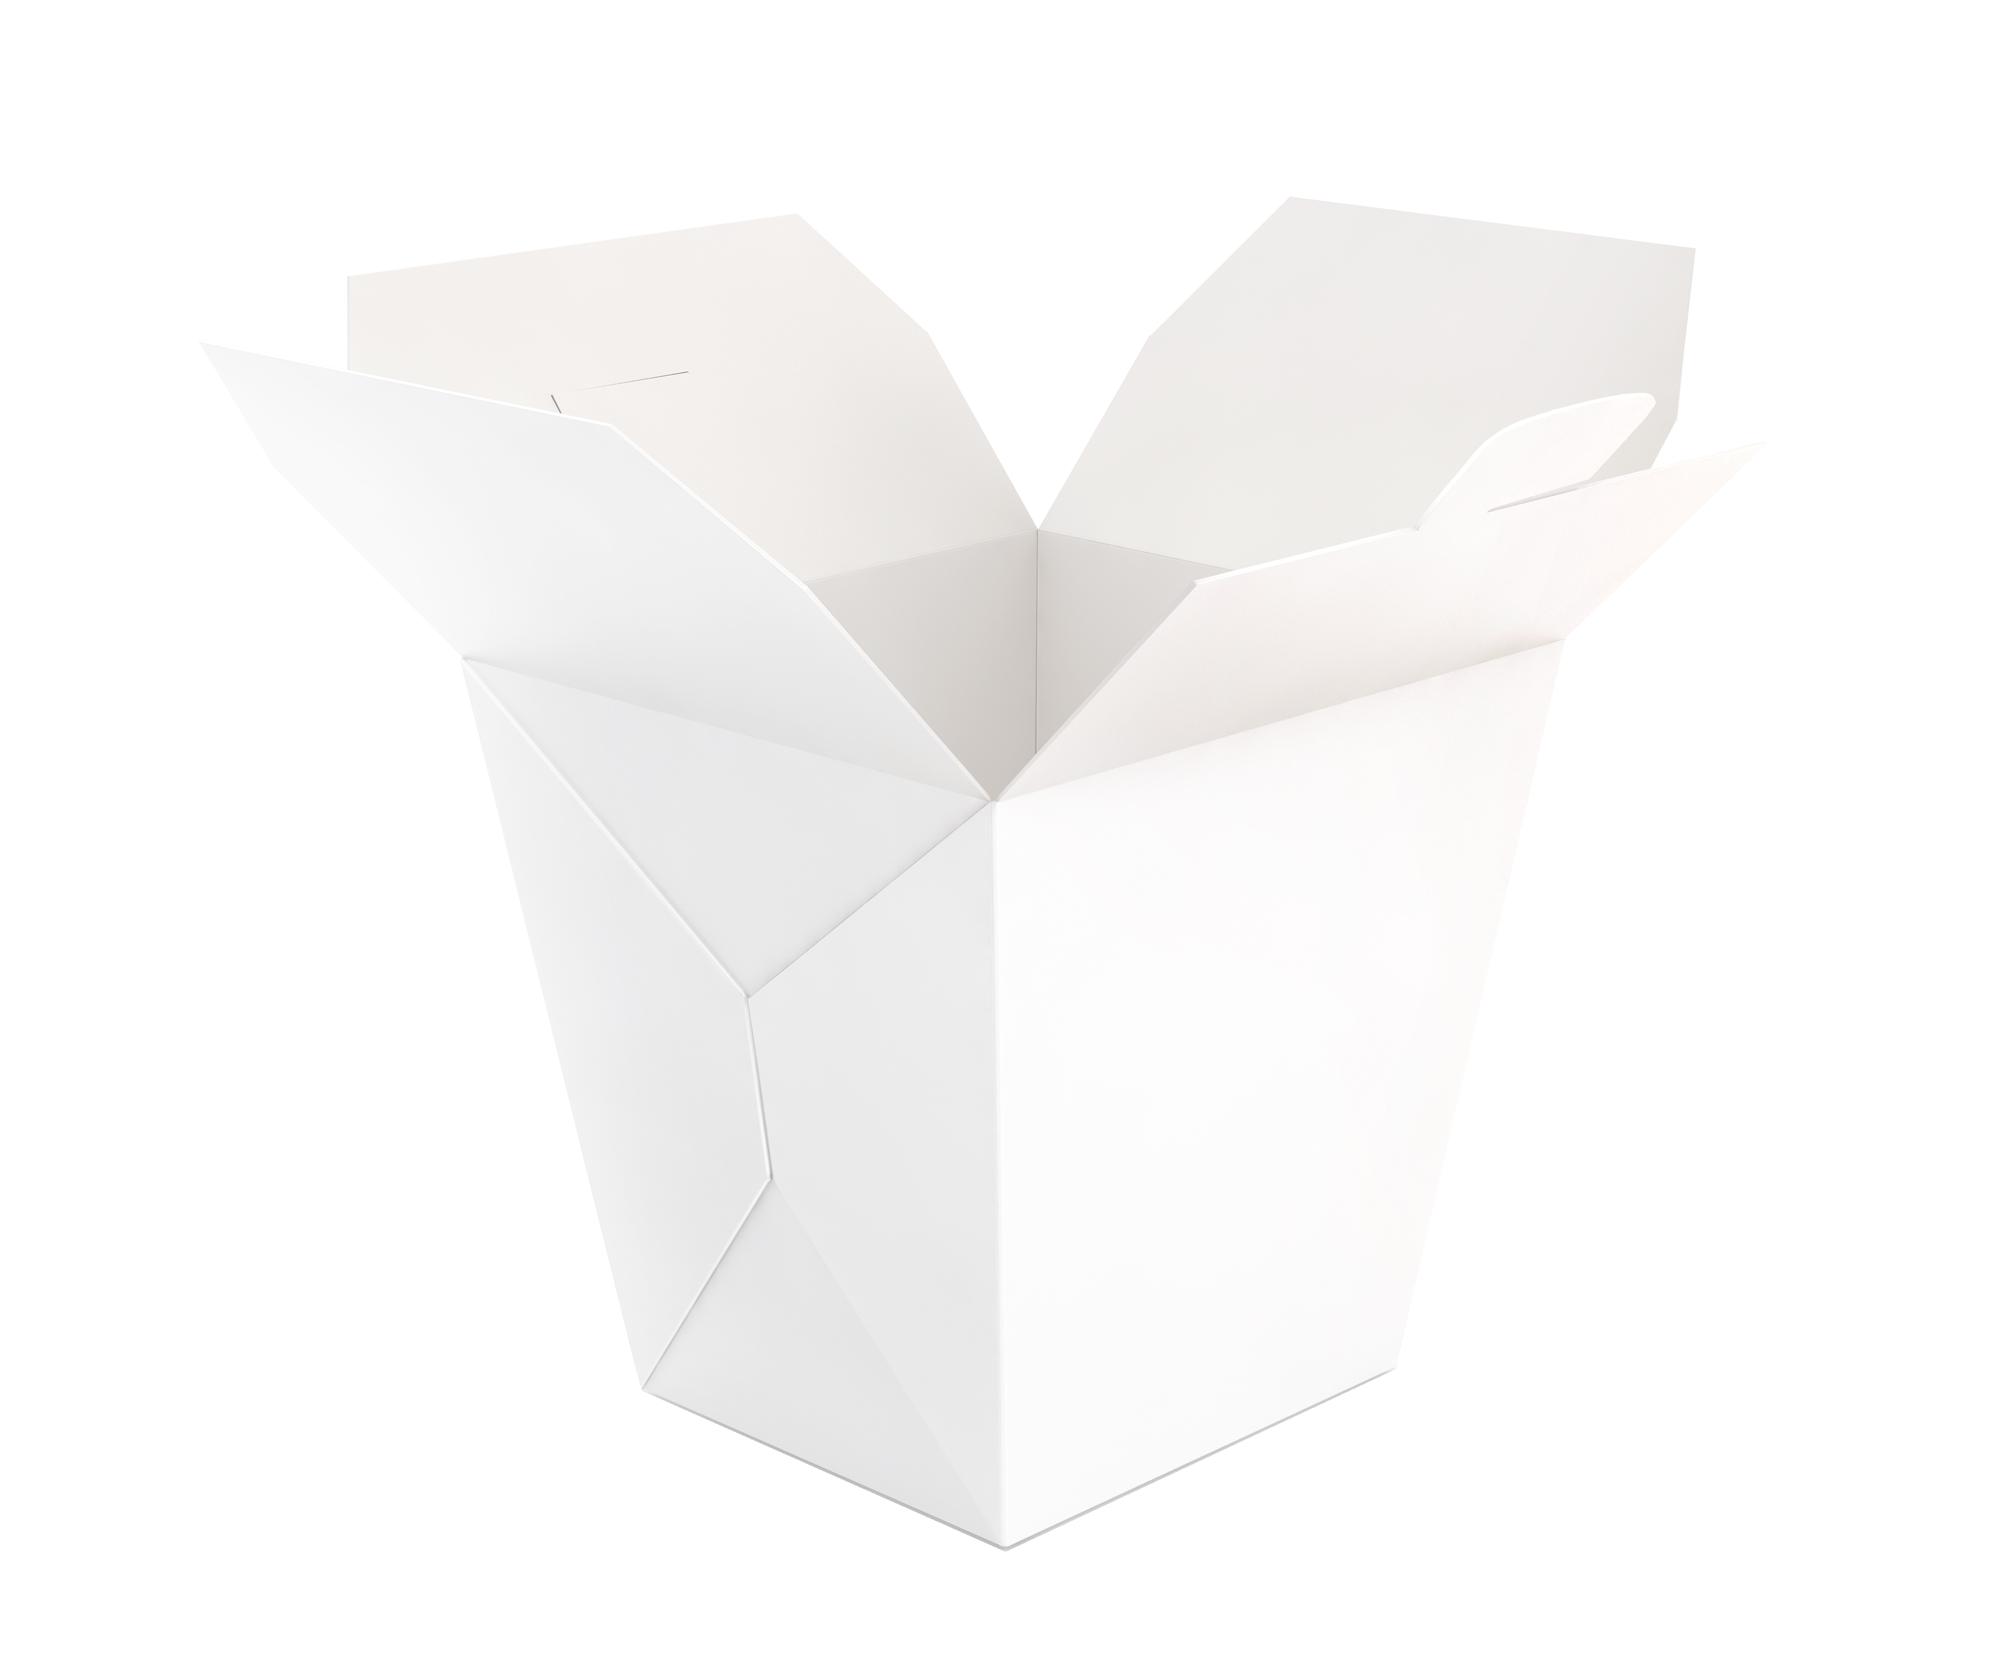 ENGELKARTON_Extrudierter-Karton_Beispiel-Food-Verpackung